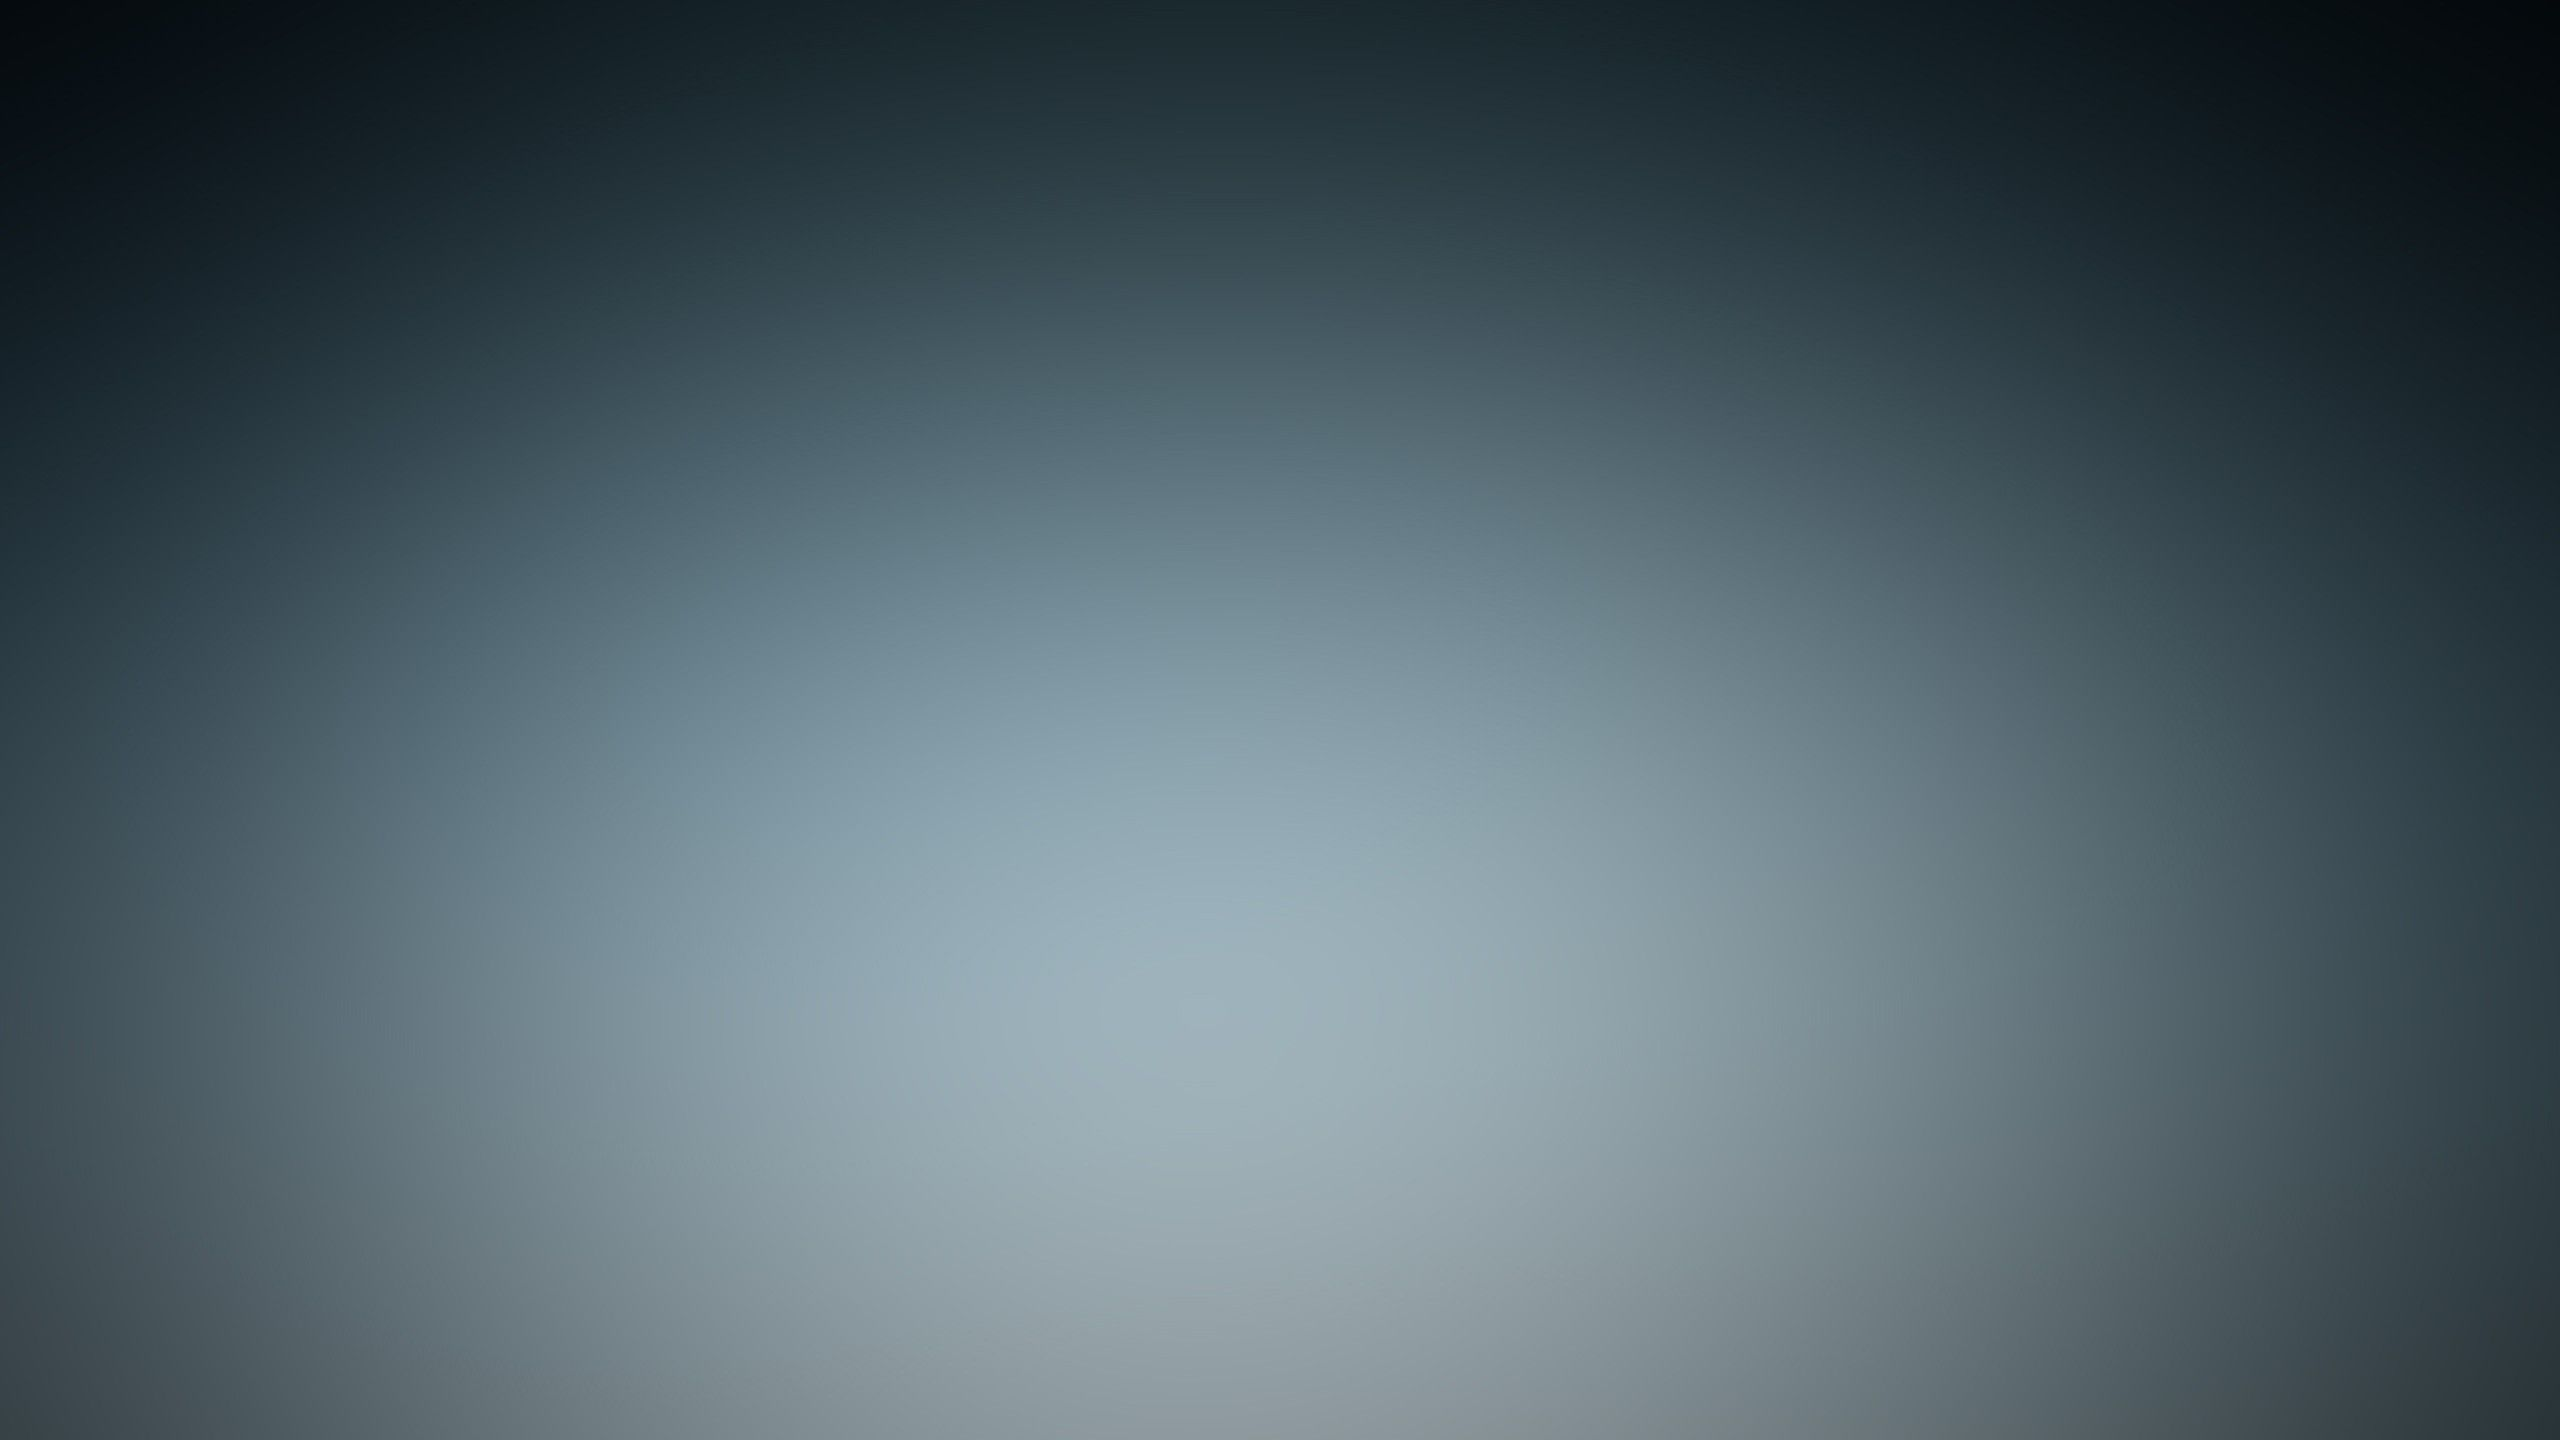 Simple Background Wallpaper 2991395 Wallbase Cc Grey Wallpaper Light Grey Wallpaper